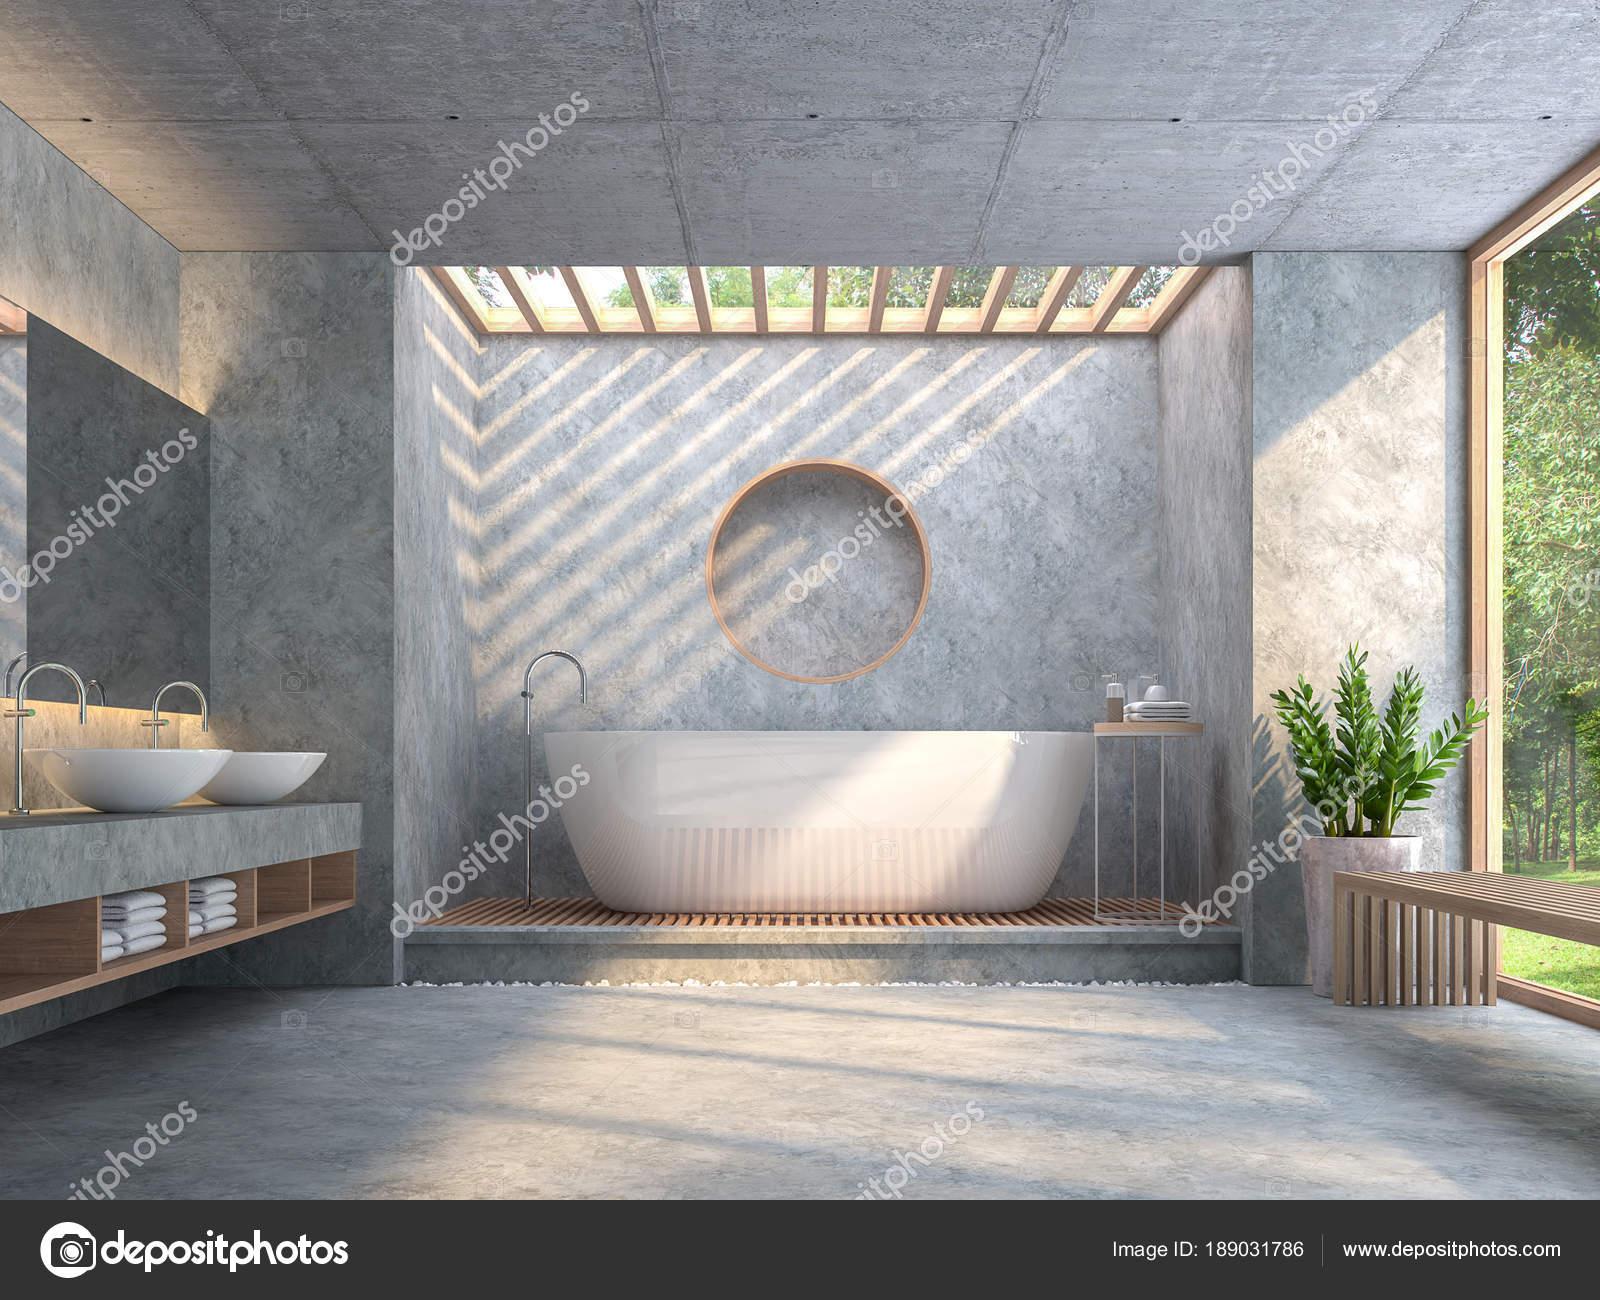 Salle Bain Style Loft Moderne Avec Rendu B Ton Poli Meubl